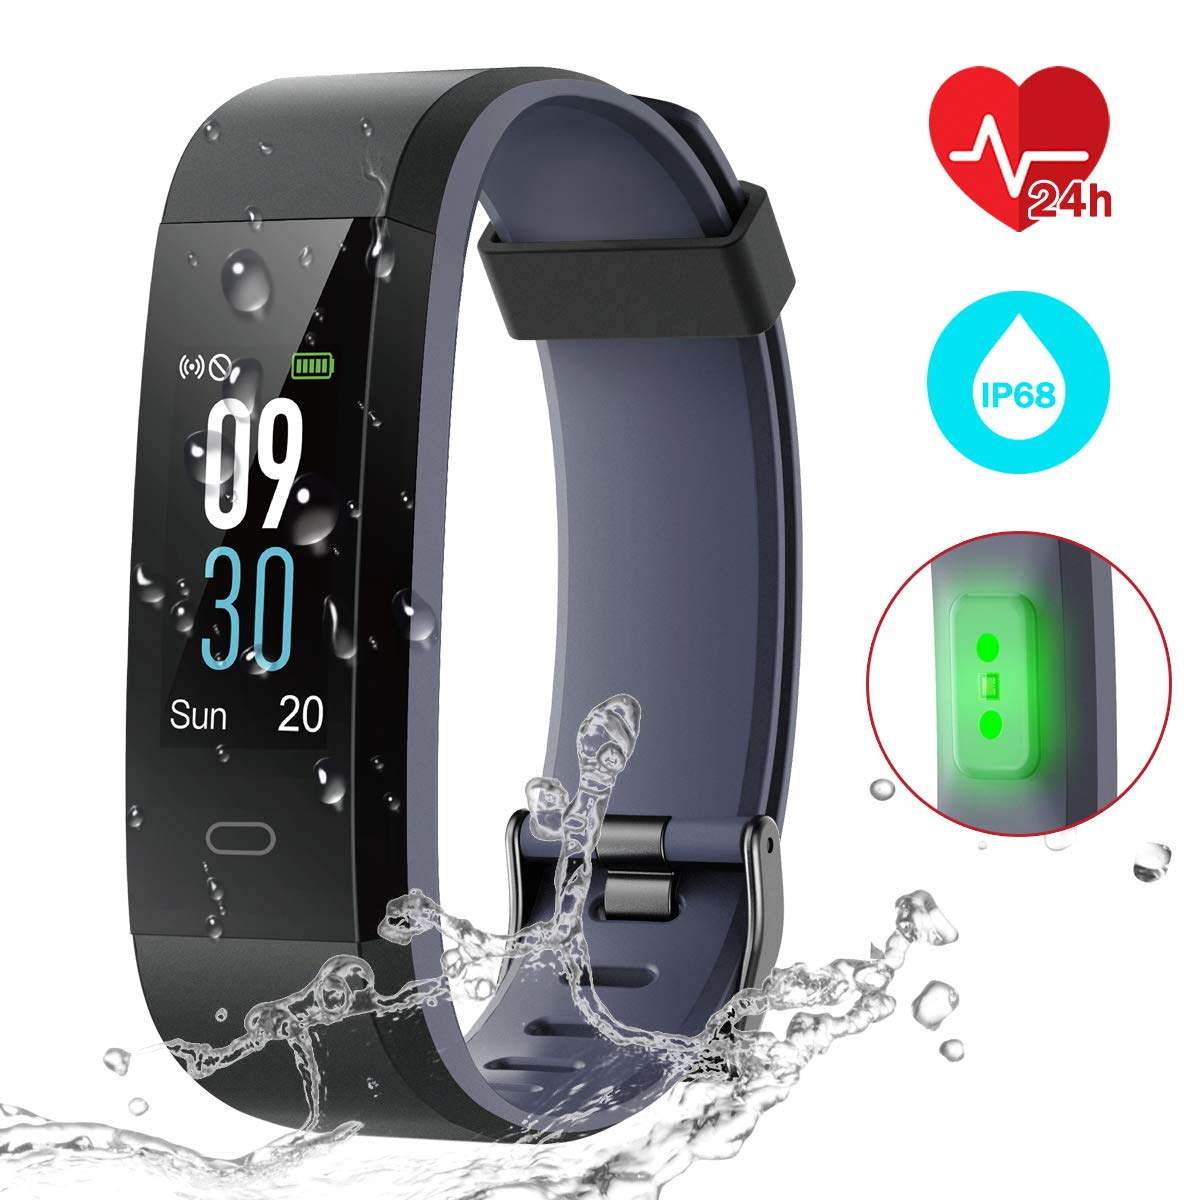 CHEREEKI Fitness Tracker IP68, Pulsera Actividad Inteligente Pantalla Color product image